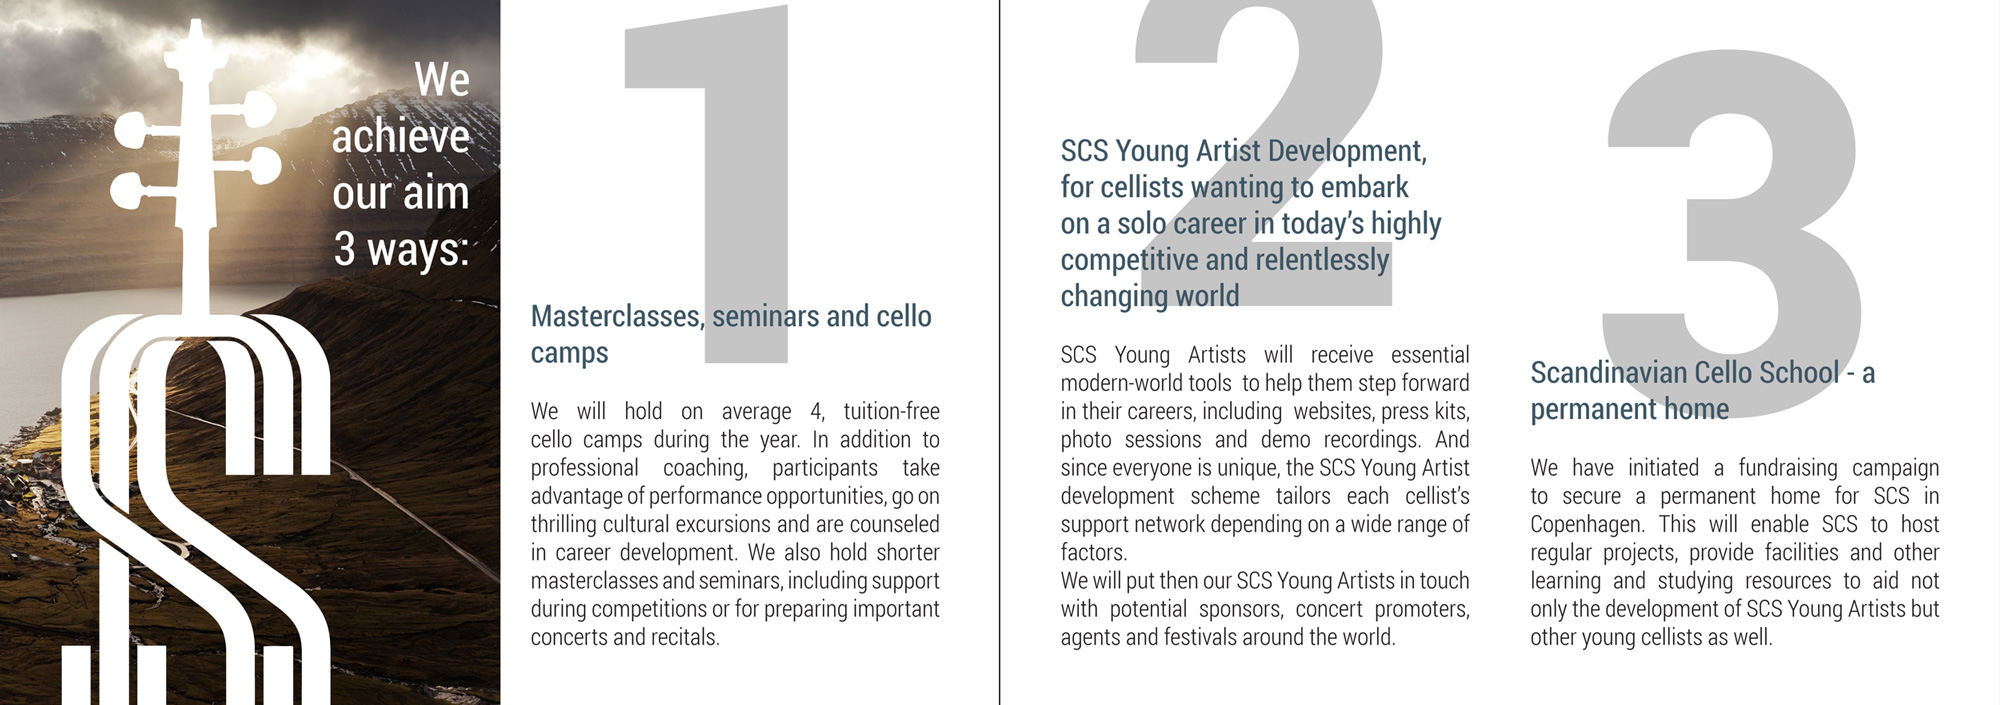 Kilmulis design - Scandinavian cello school - brochure 04